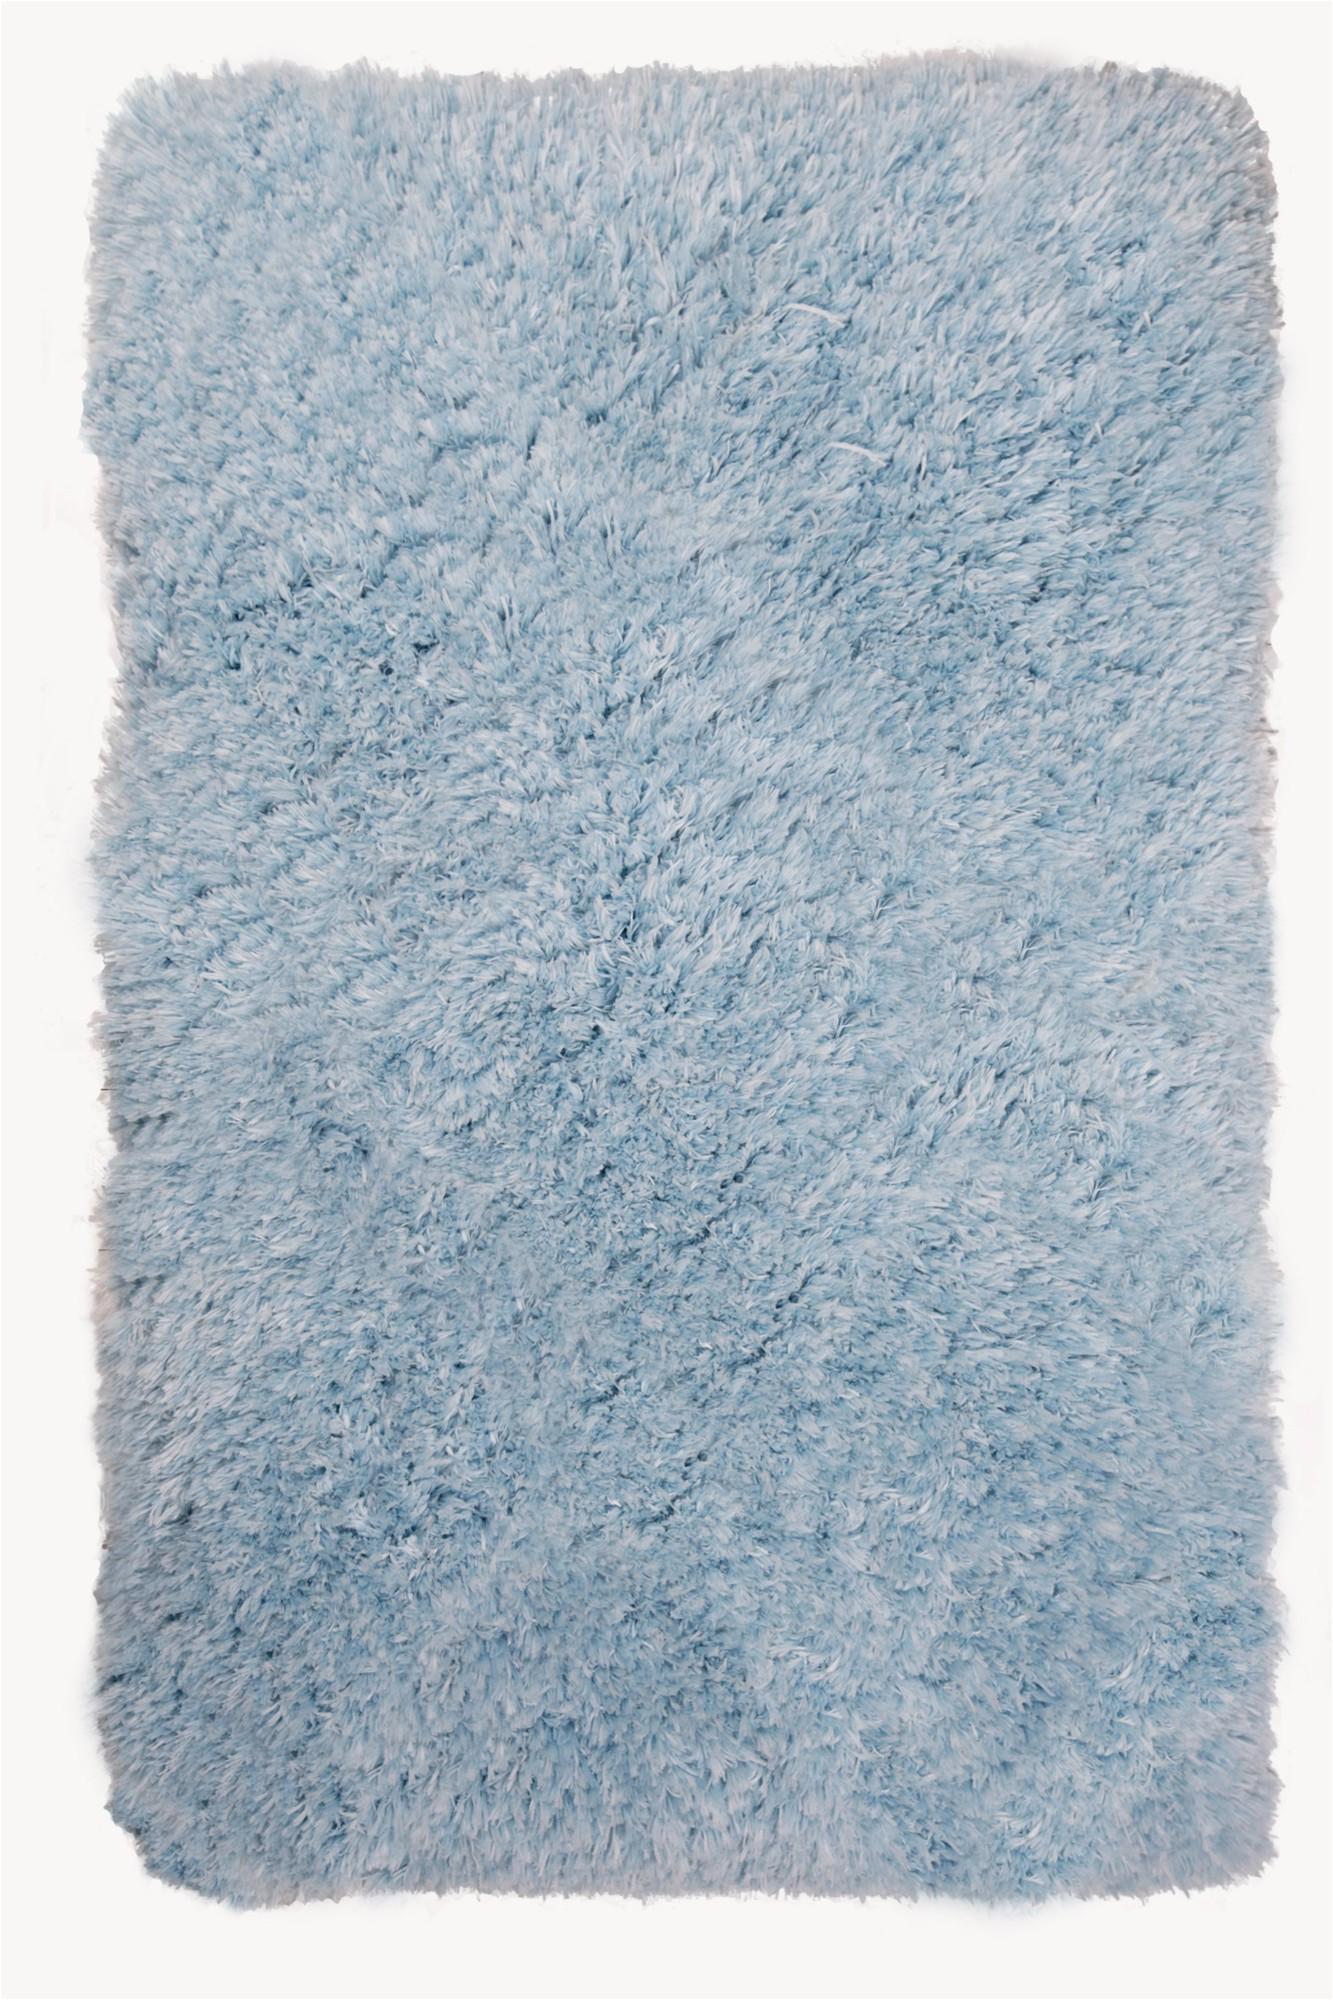 Light Blue Shag area Rug Nicole Miller Designer area Rugs Casey Css 301 Light Blue Shag Flokati solid Rug